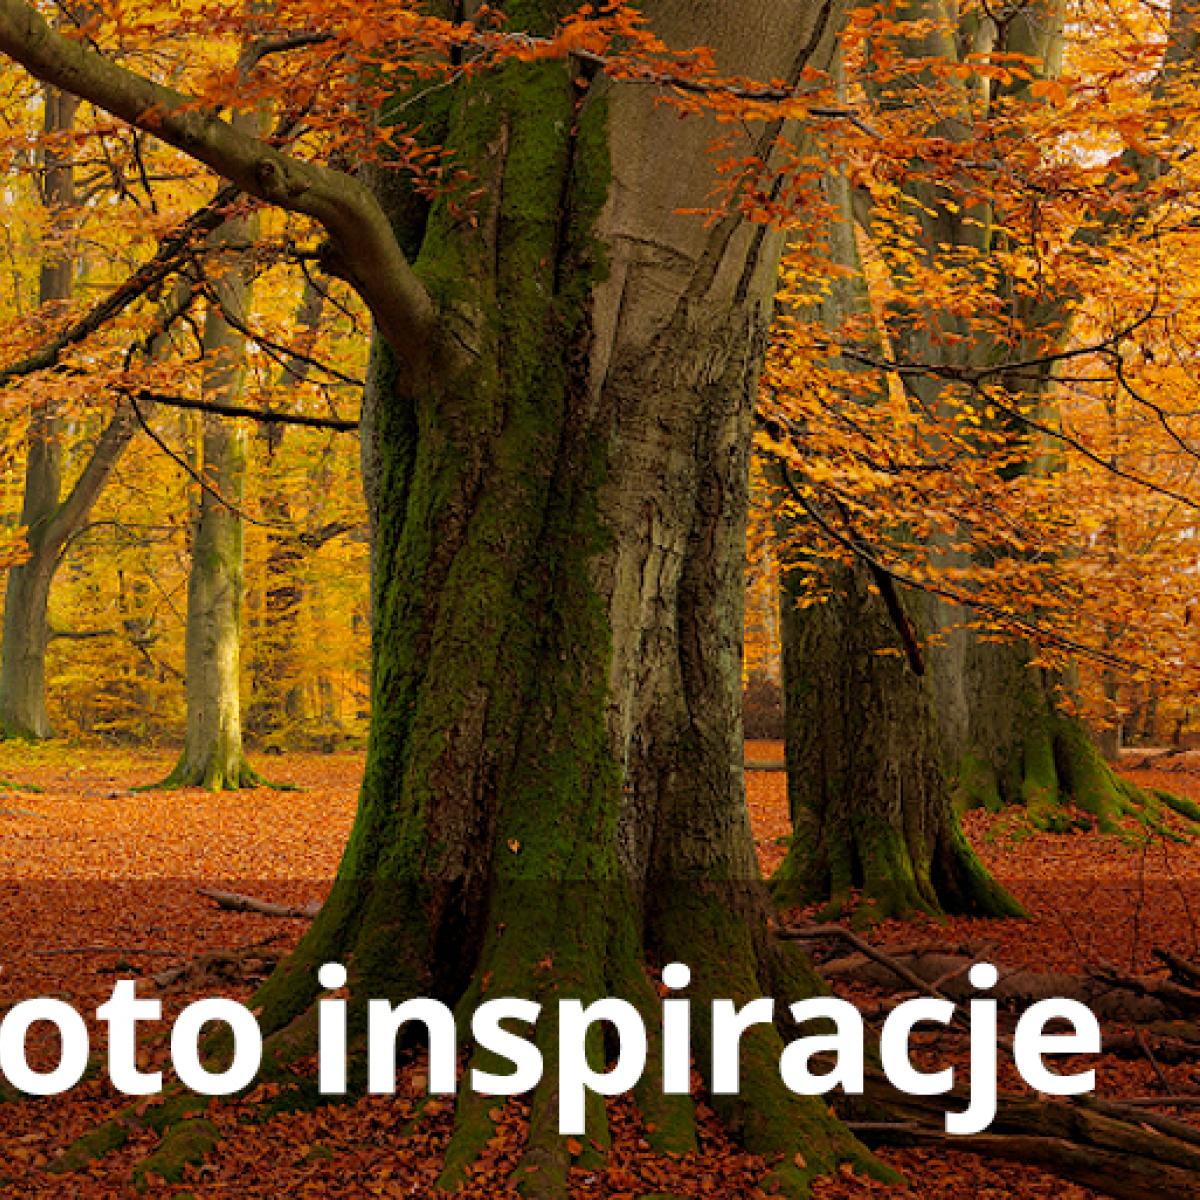 Pod patronatem Gallerystore: Konkurs Canon&Komputronik: Foto inspiracje - Edycja jesienna!